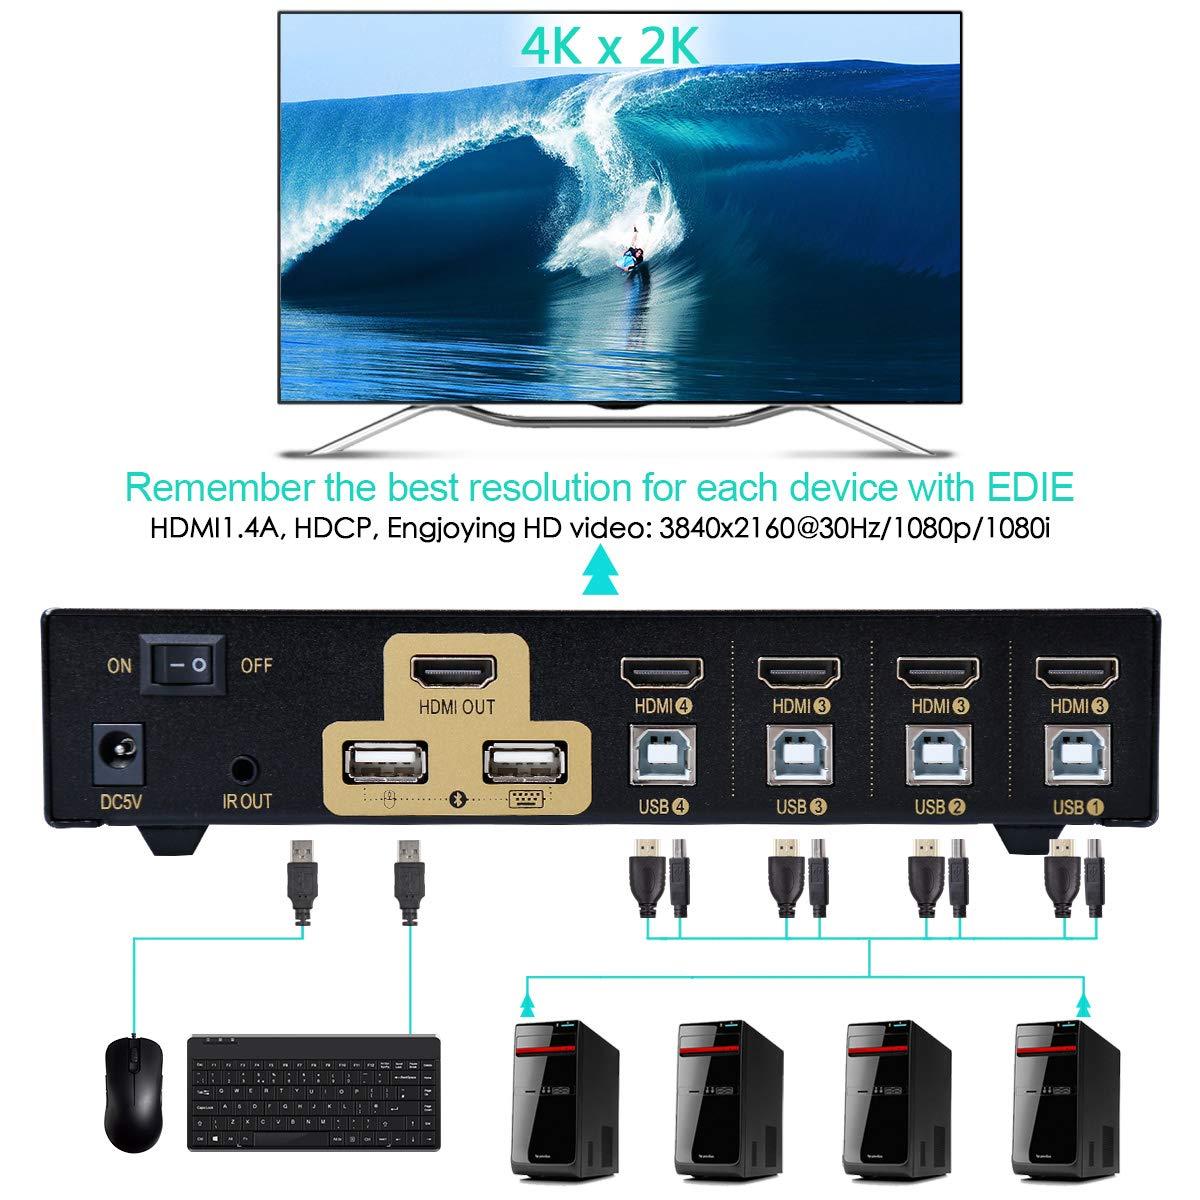 Sea Wit 4 Port HDMI KVM Switch 4K with Remote Control